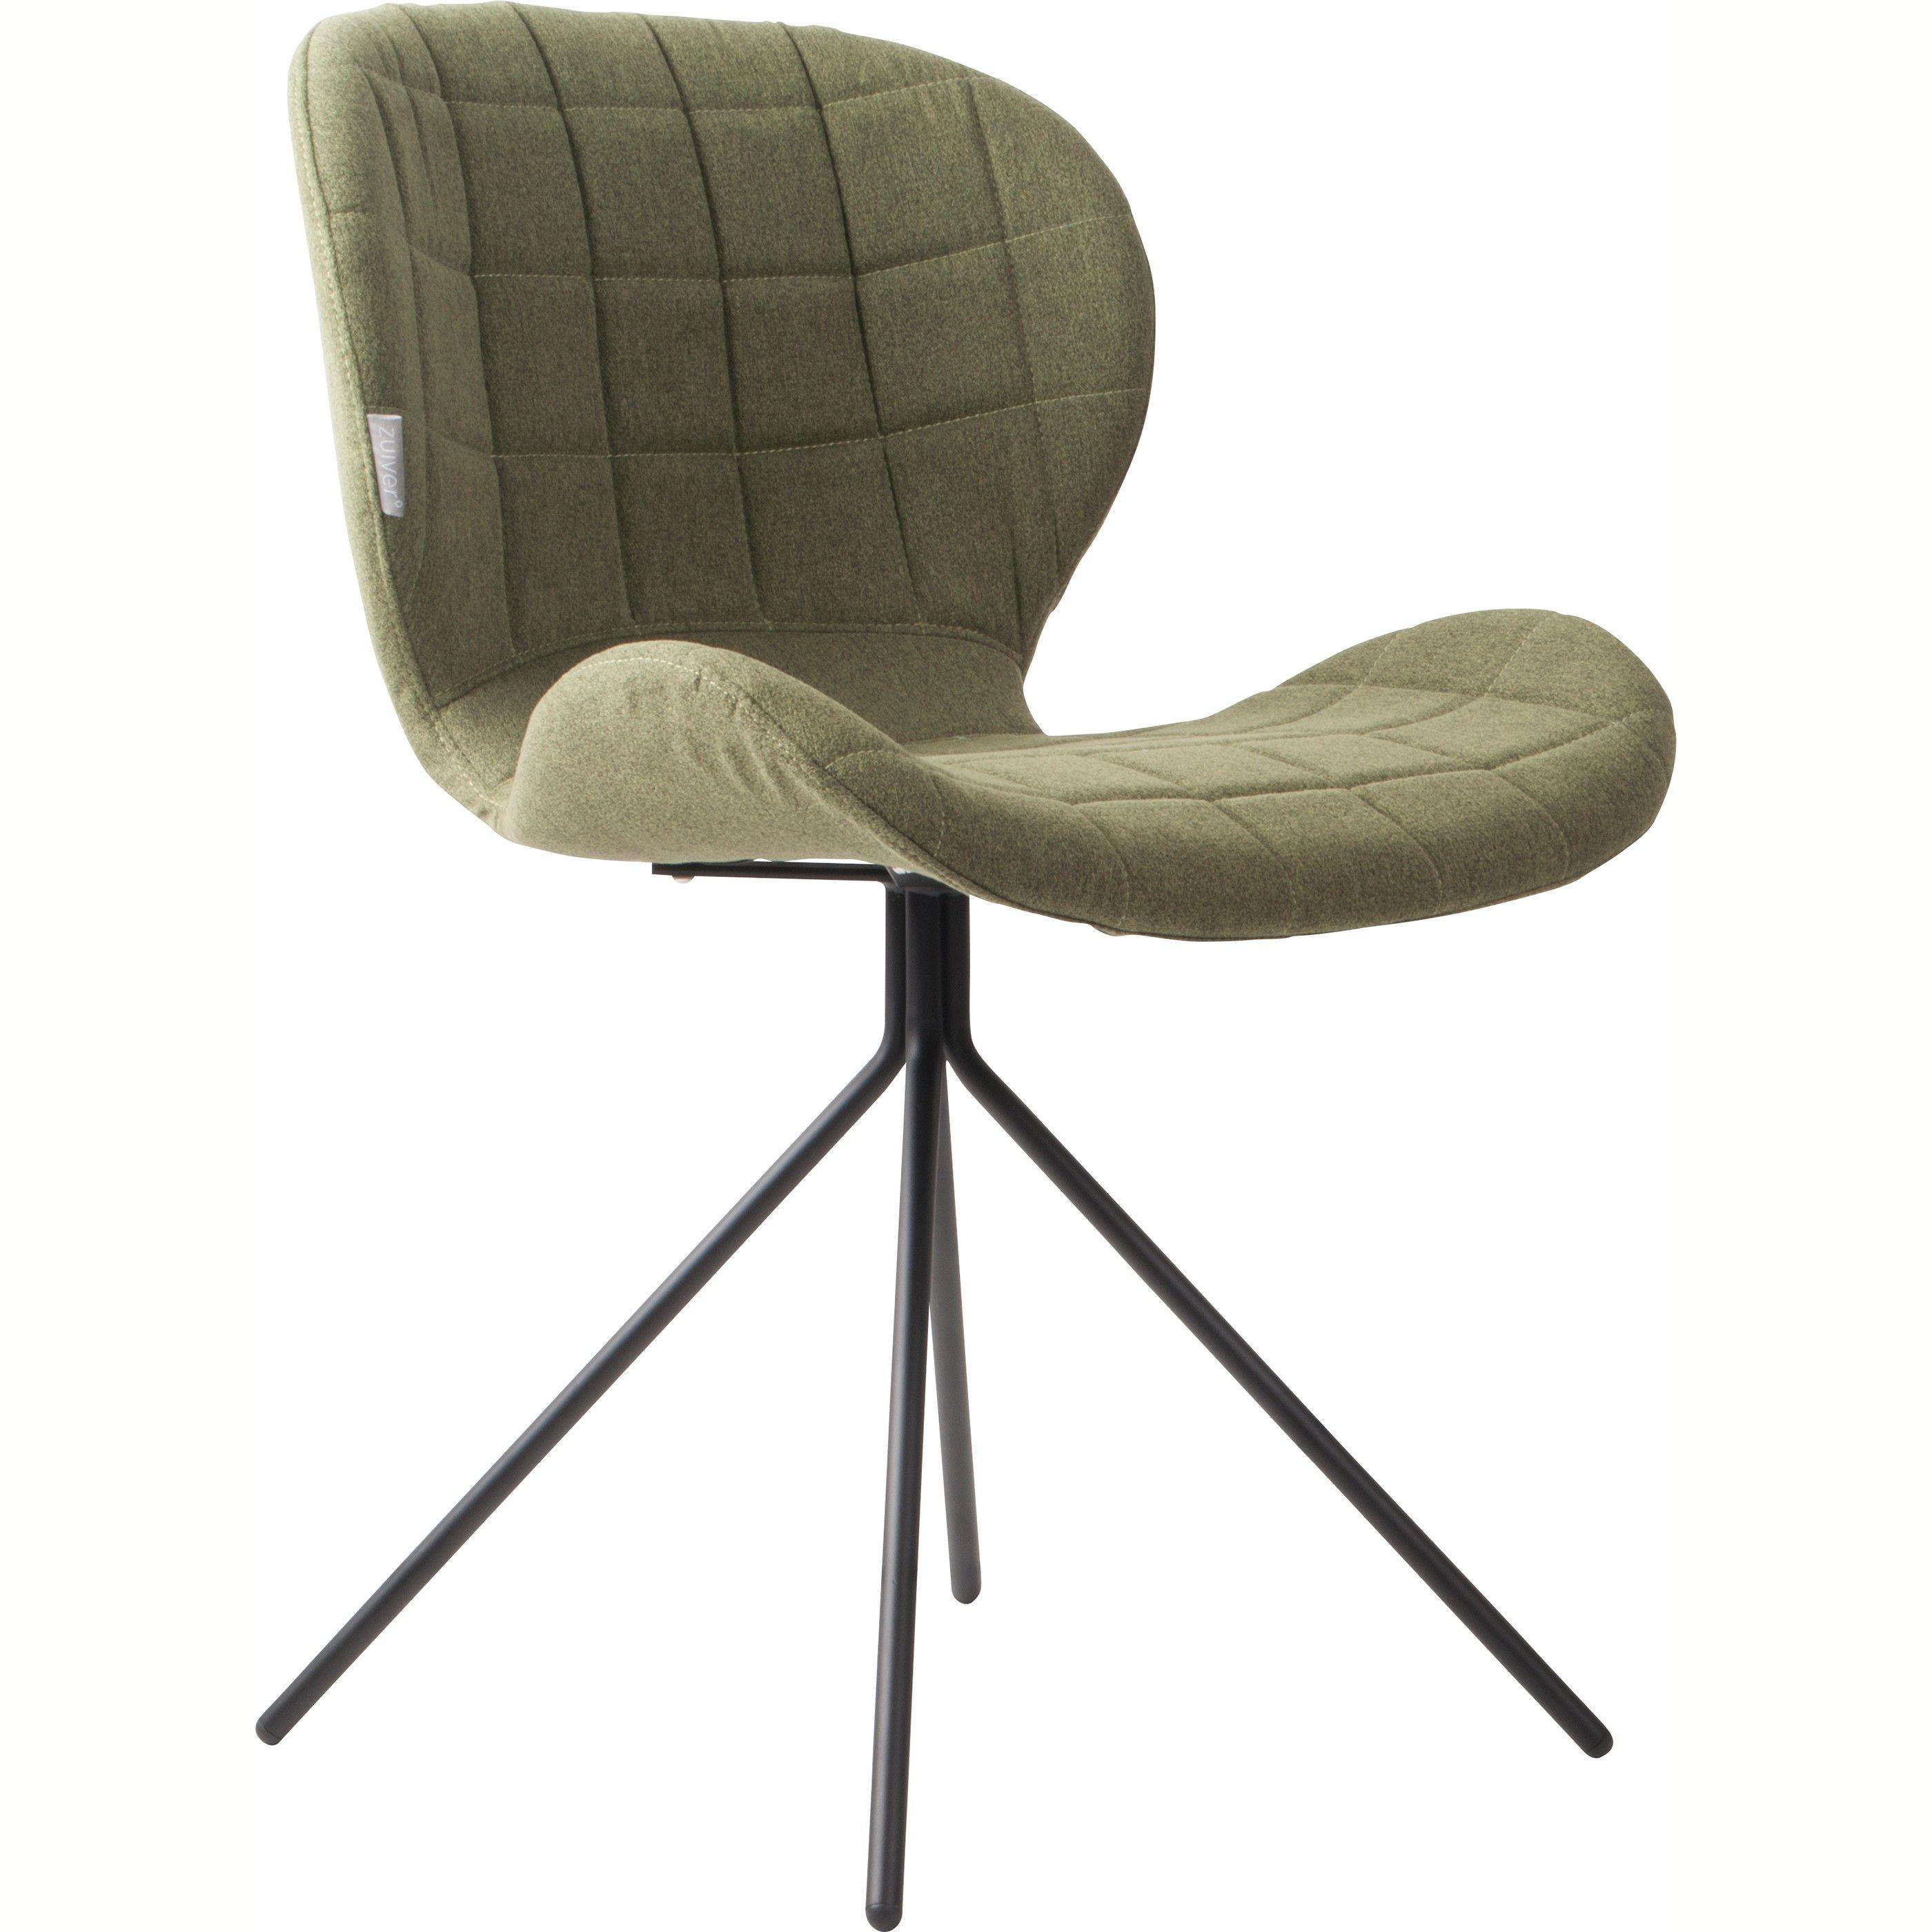 OMG stoel | Zuiver